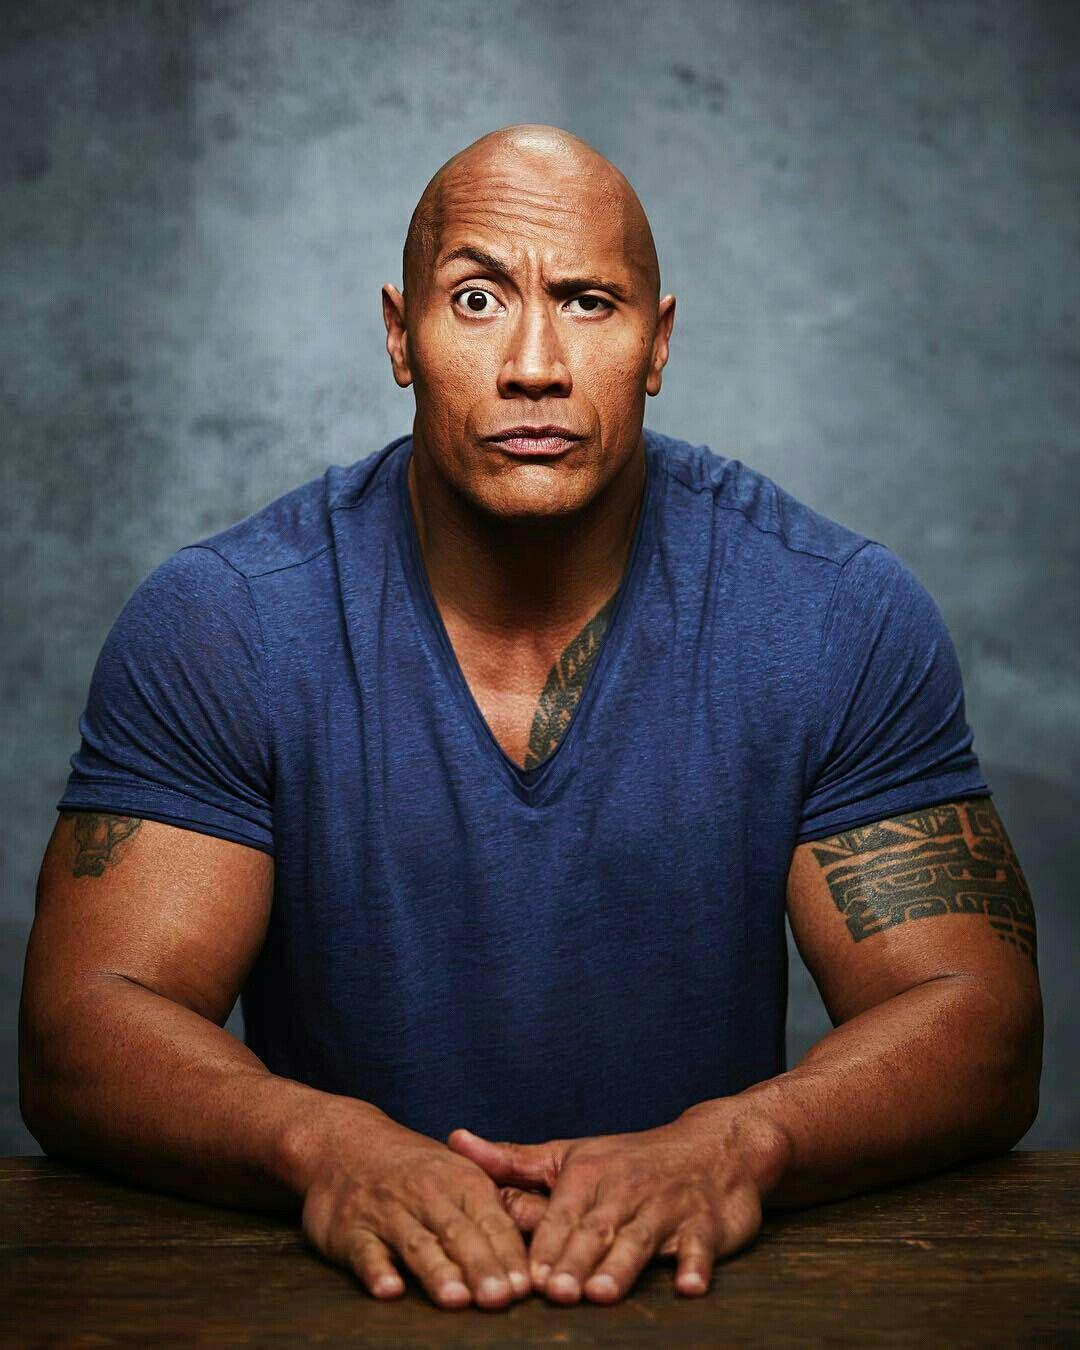 Dwayne Johnson | The rock dwayne johnson, Dwayne johnson, Dwayne the rock